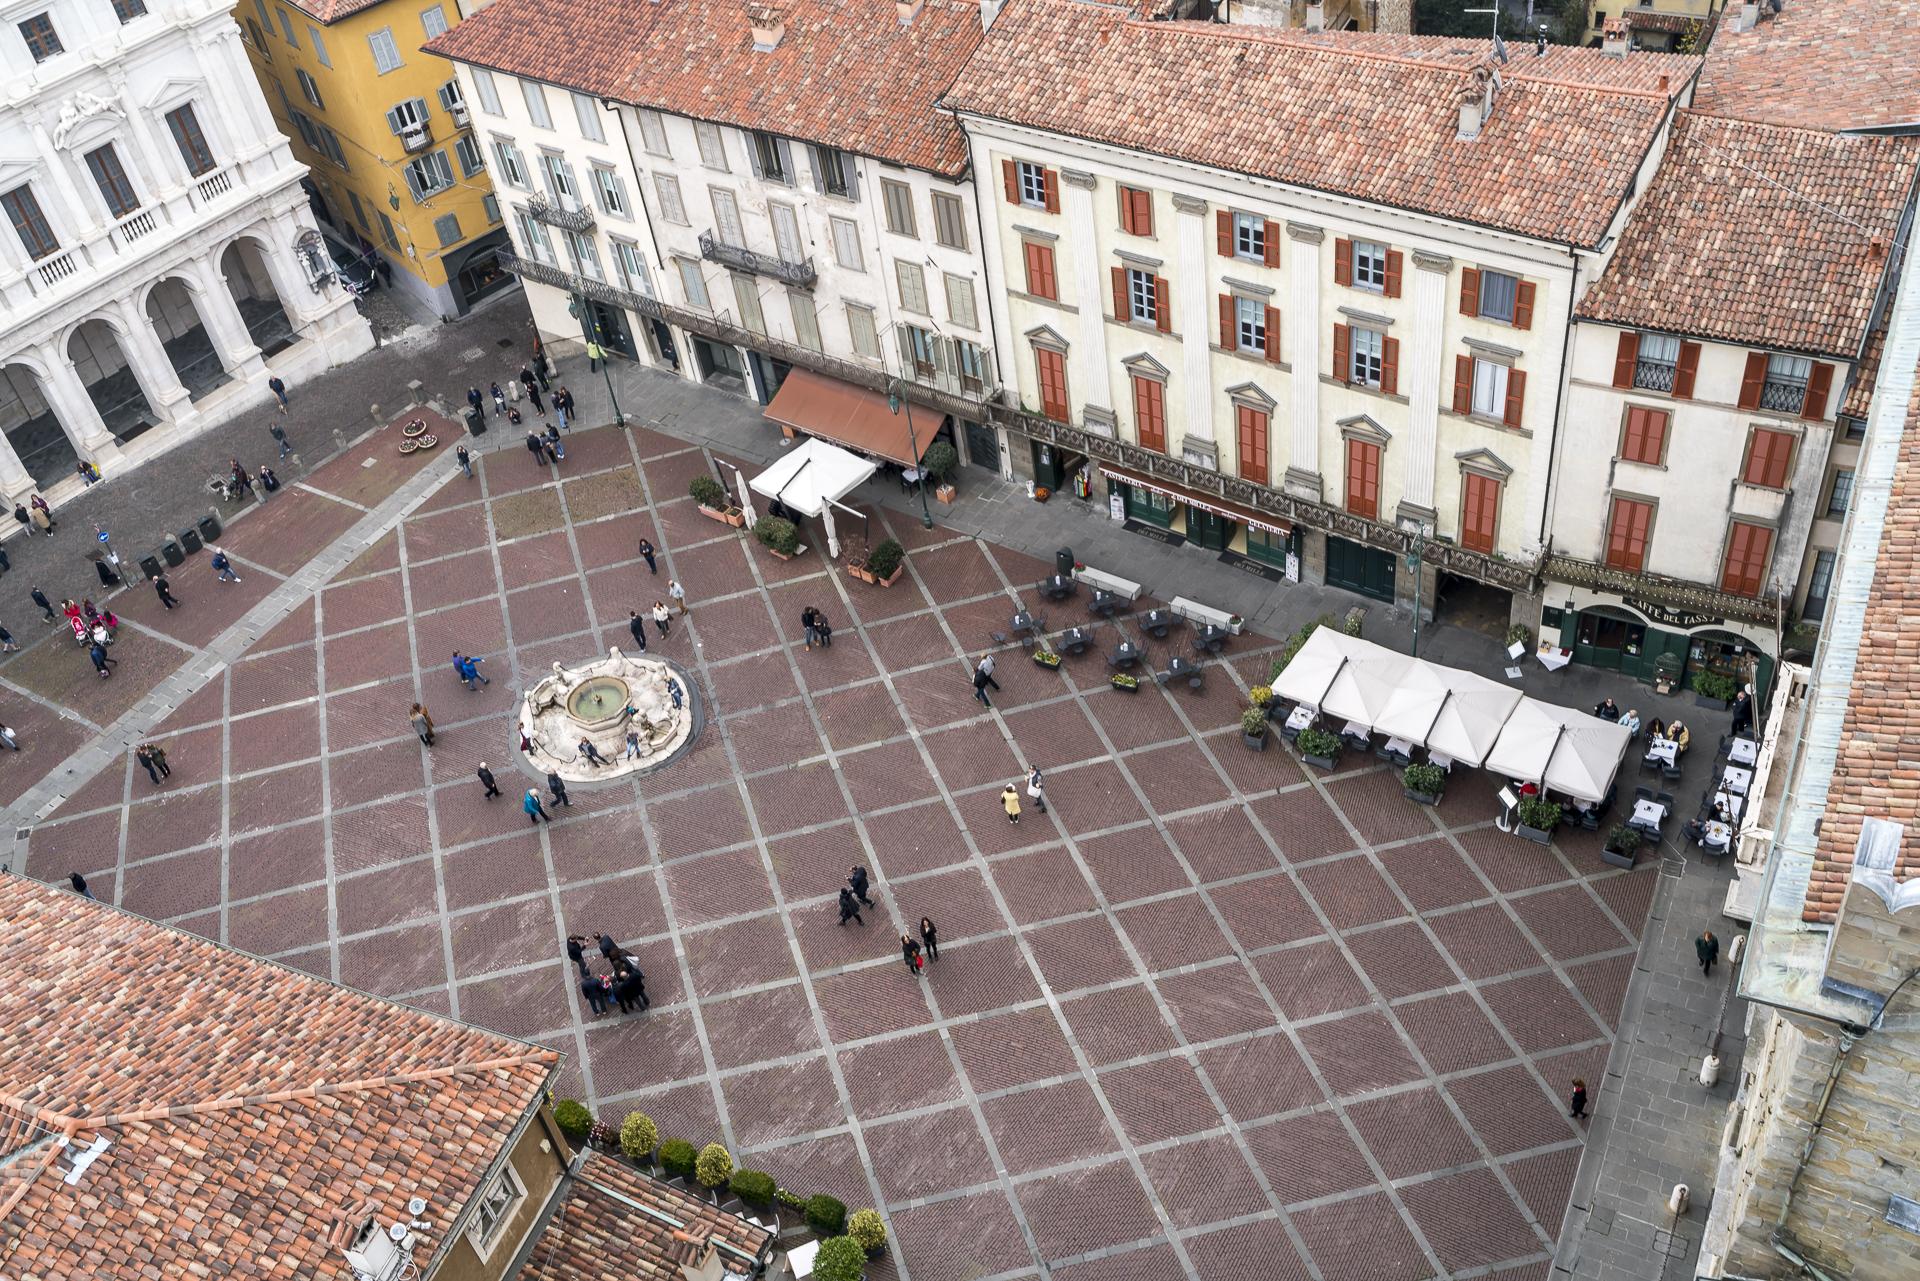 Campeone Torre Civica Aussicht